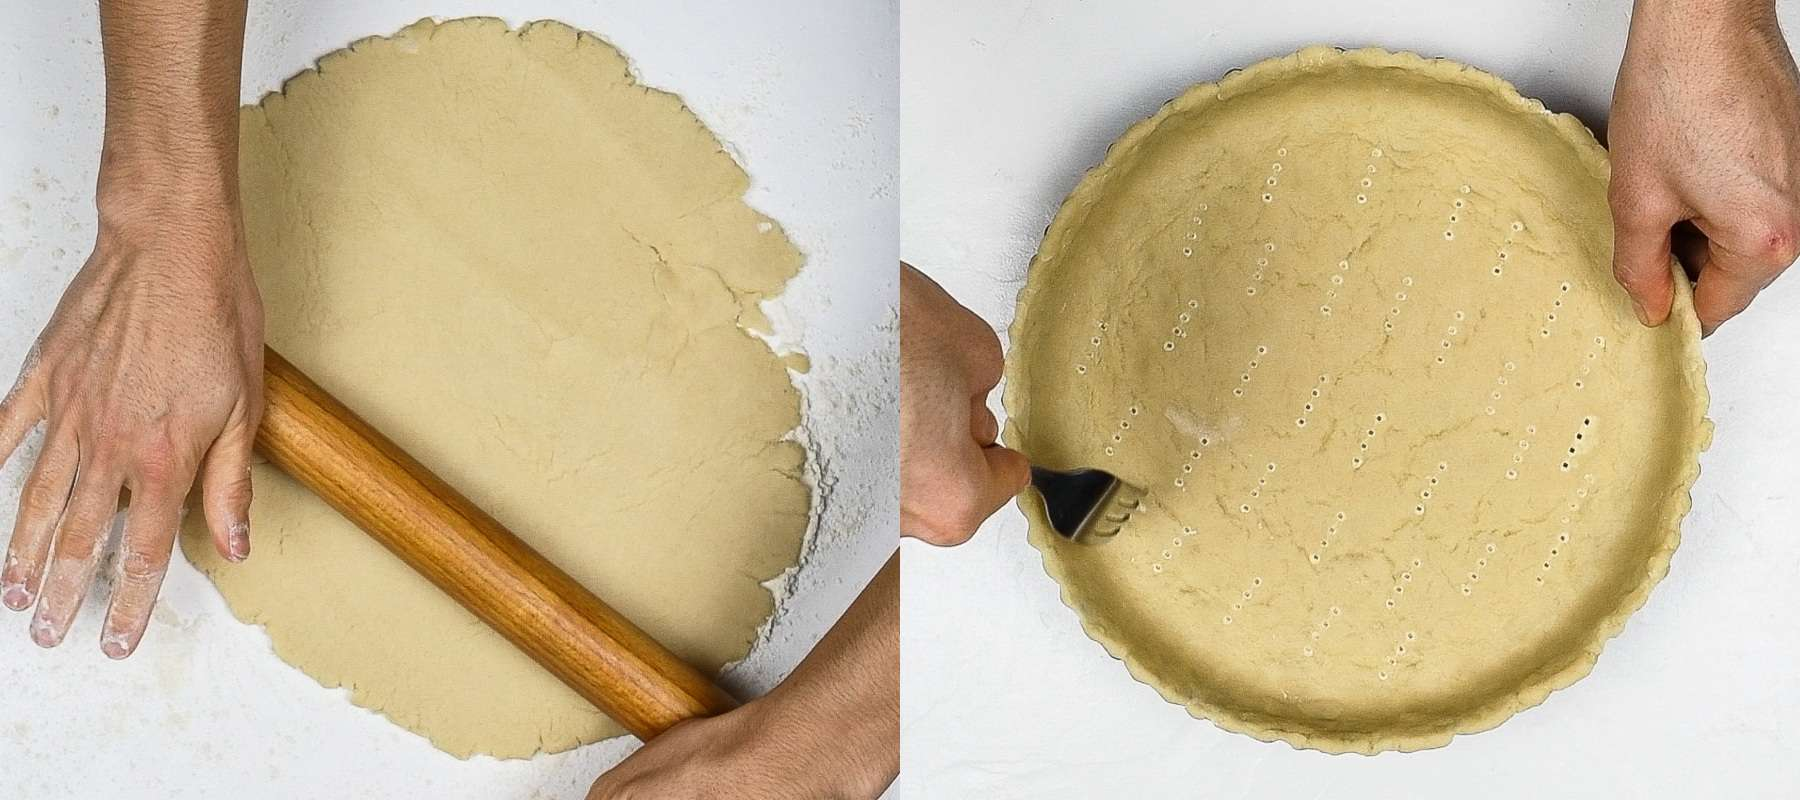 step 2 - lining the pie dish